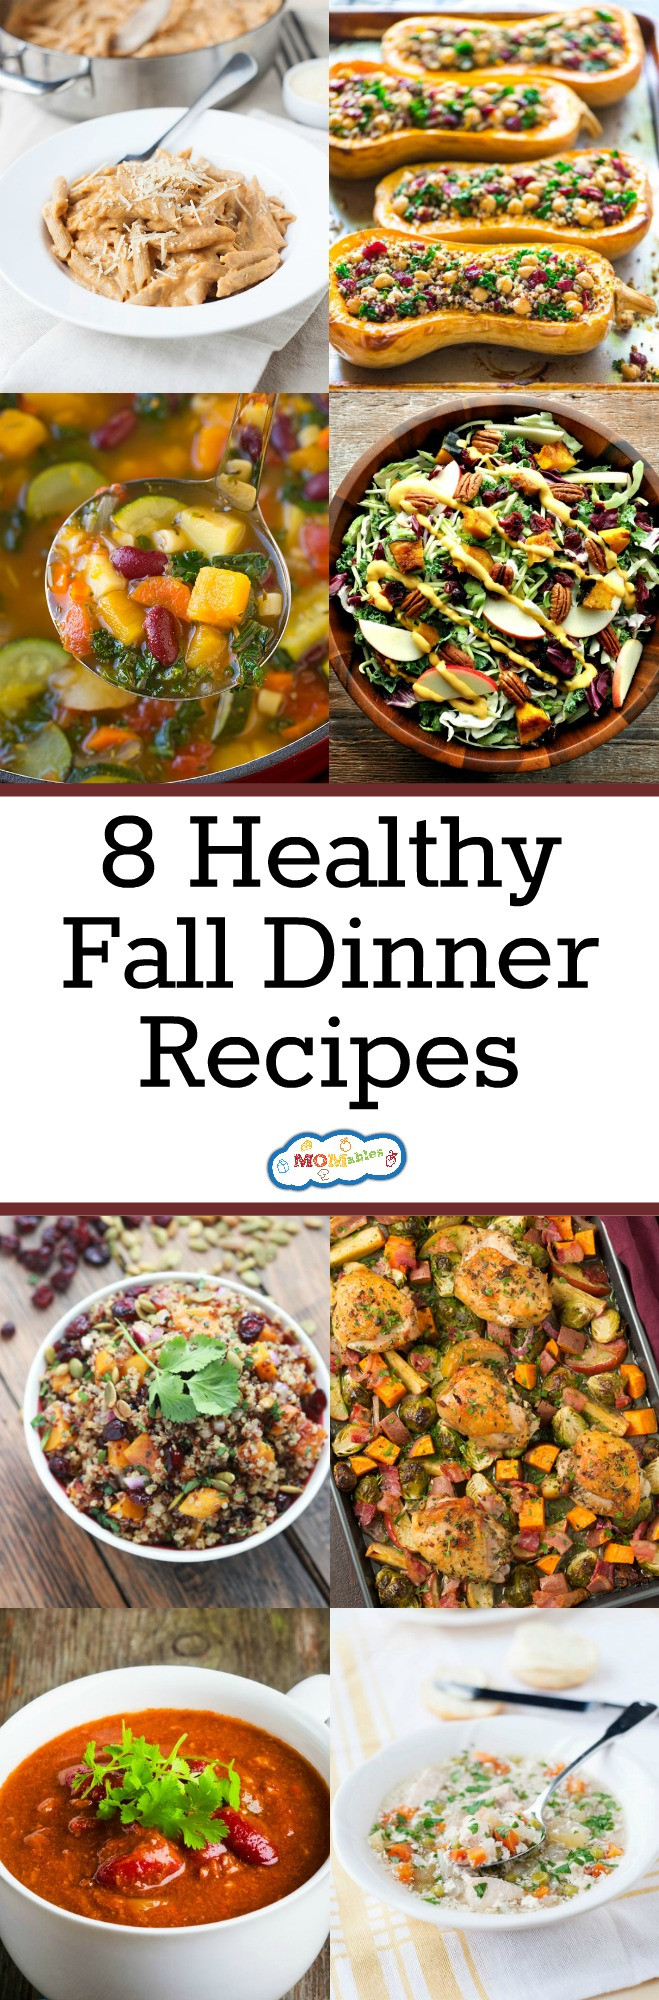 Fall Dinner Ideas  8 Healthy Fall Dinner Recipes MOMables Good Food